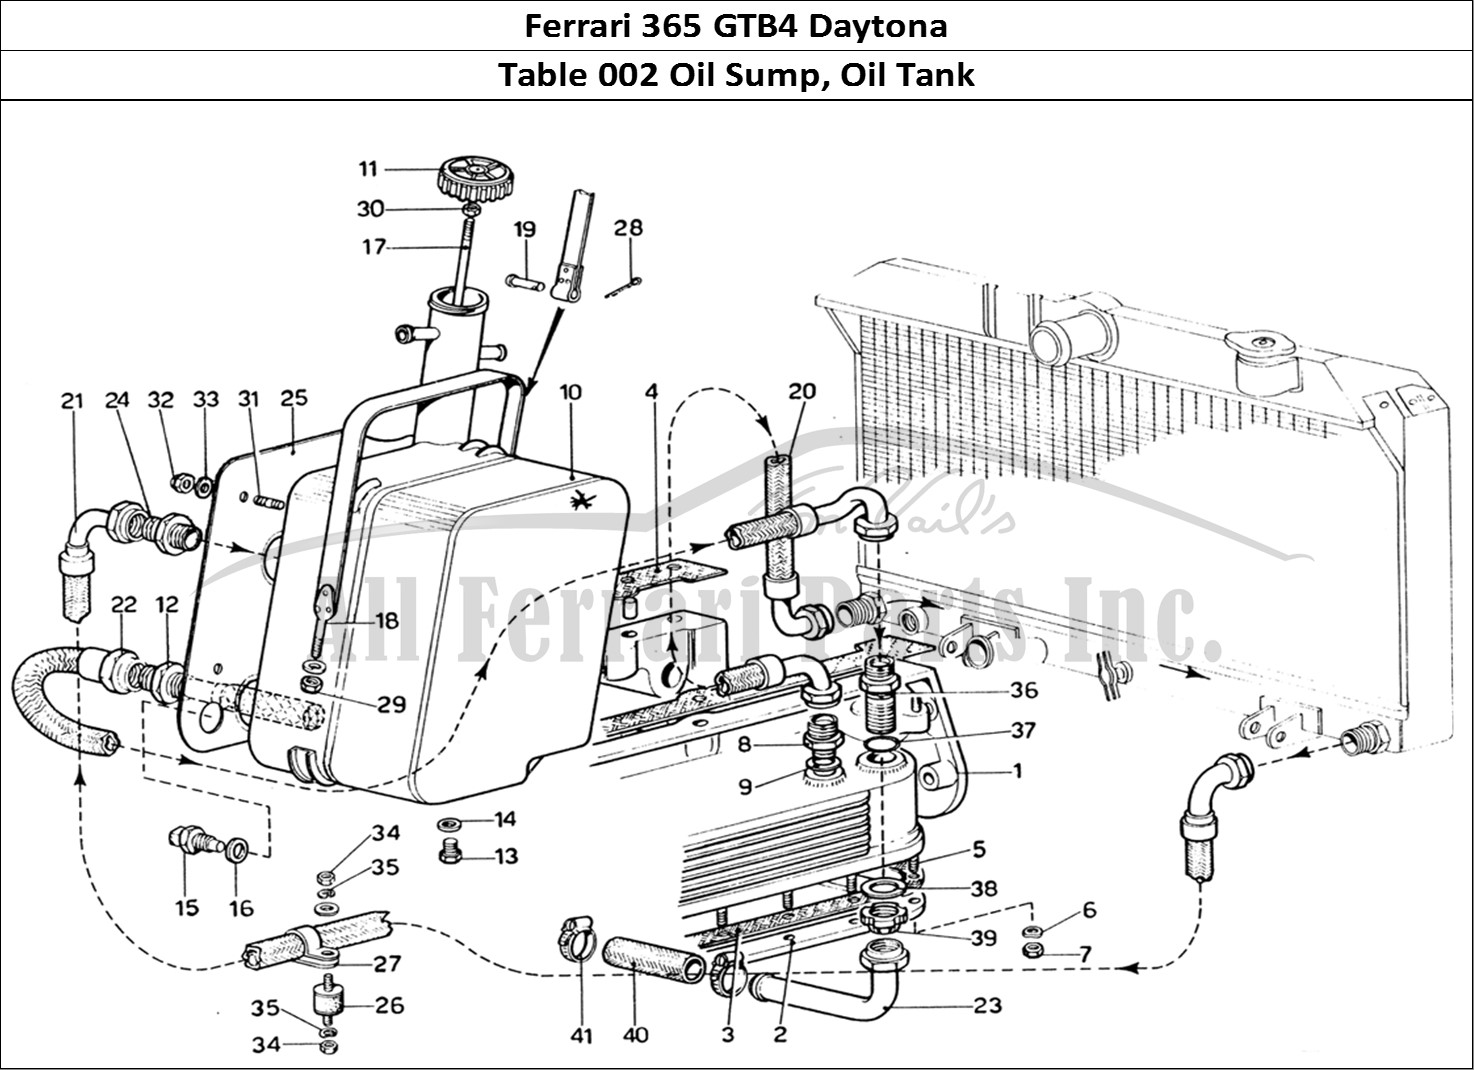 Buy Original Ferrari 365 Gtb4 Daytona 002 Oil Sump Oil